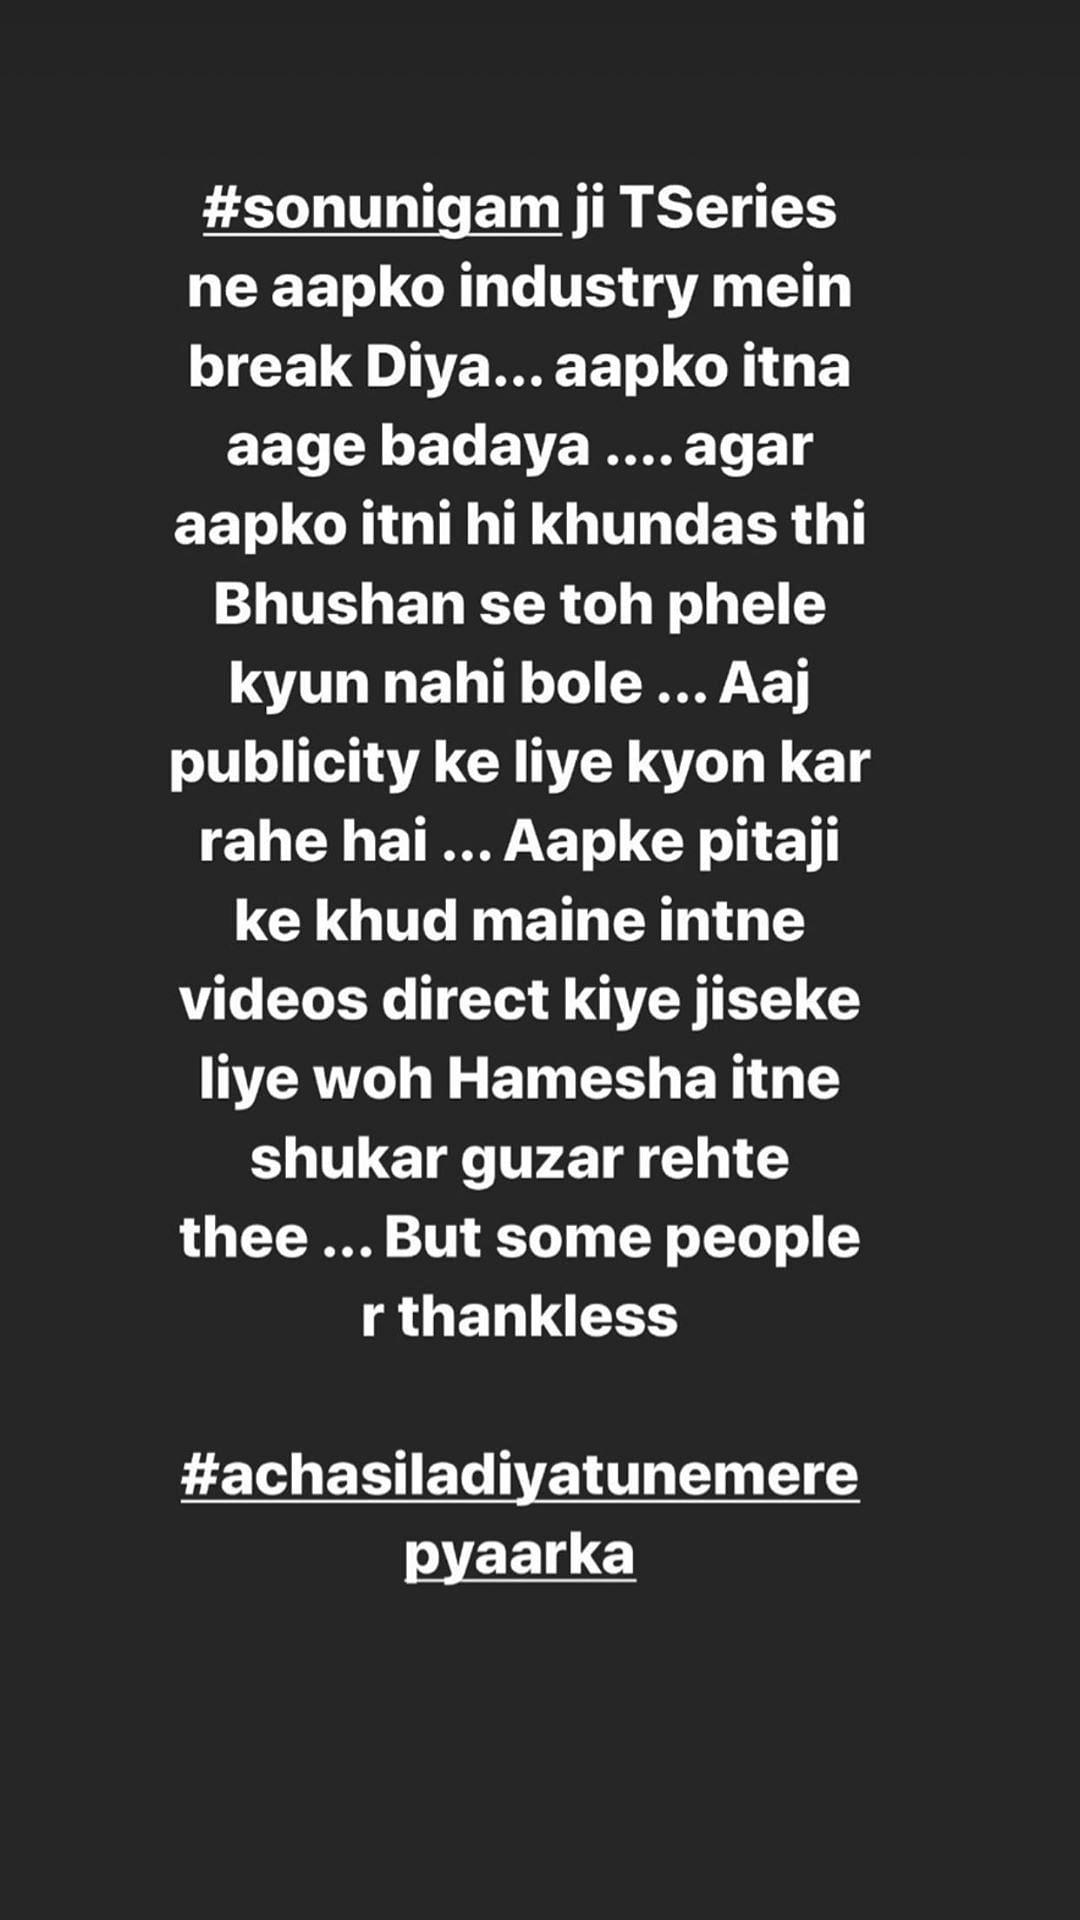 Divya Khosla Reacts to Sonu Nigam's Video, Calls Him 'Thankless'